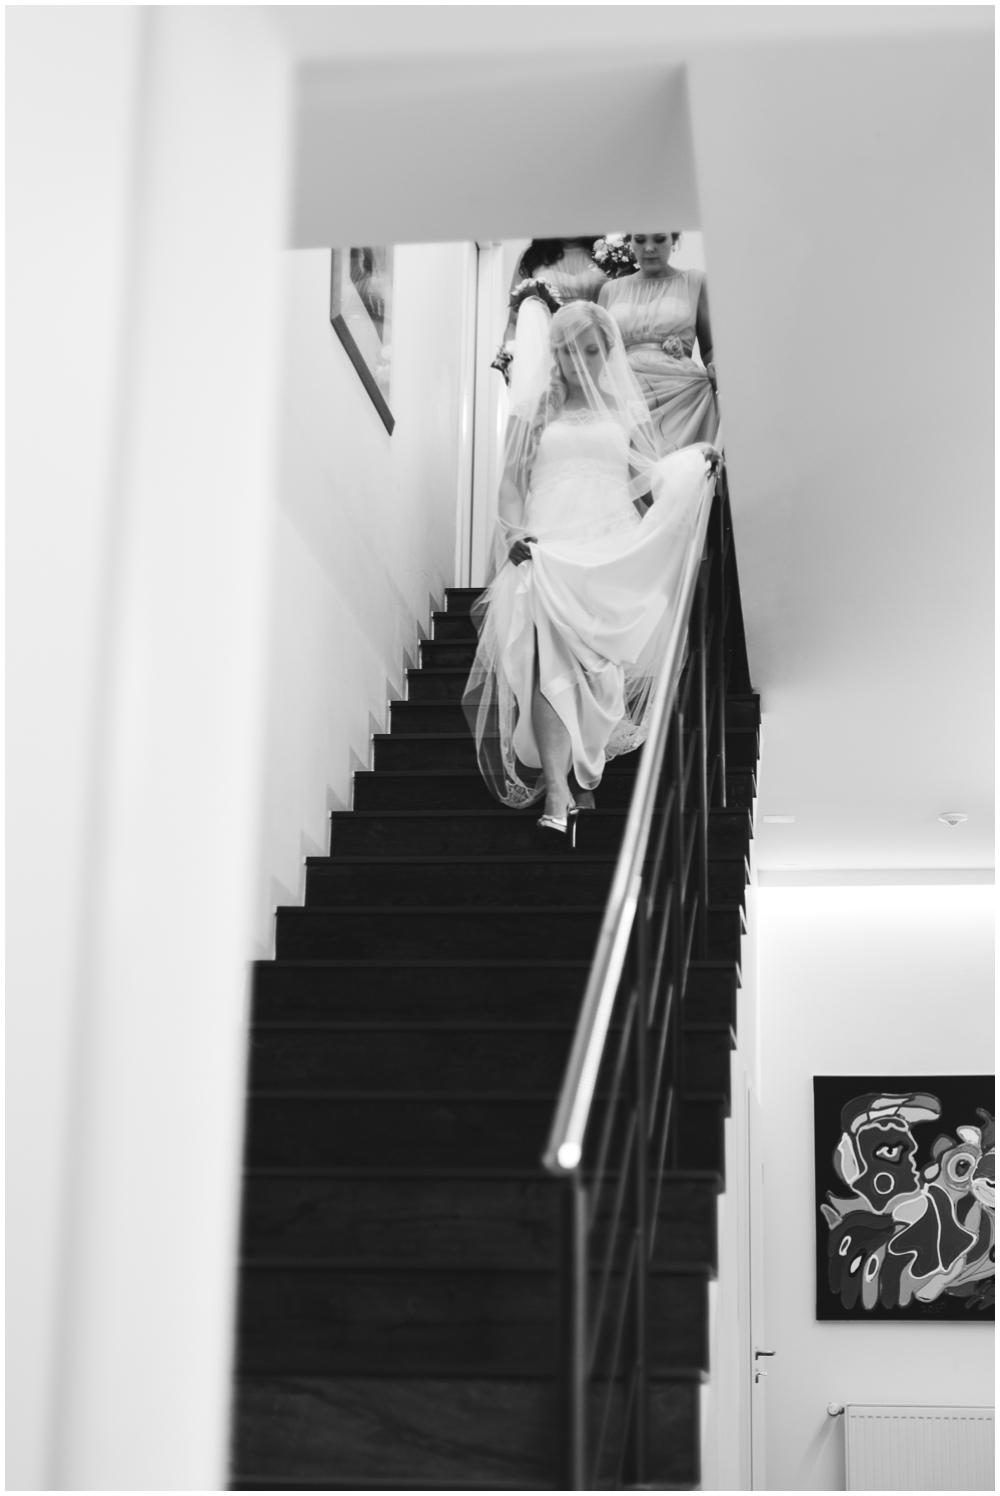 LE HAI LINH Photography-Hochzeitsfotograf-Hochzeitsreportage in Gut Hohenholz_0036.jpg